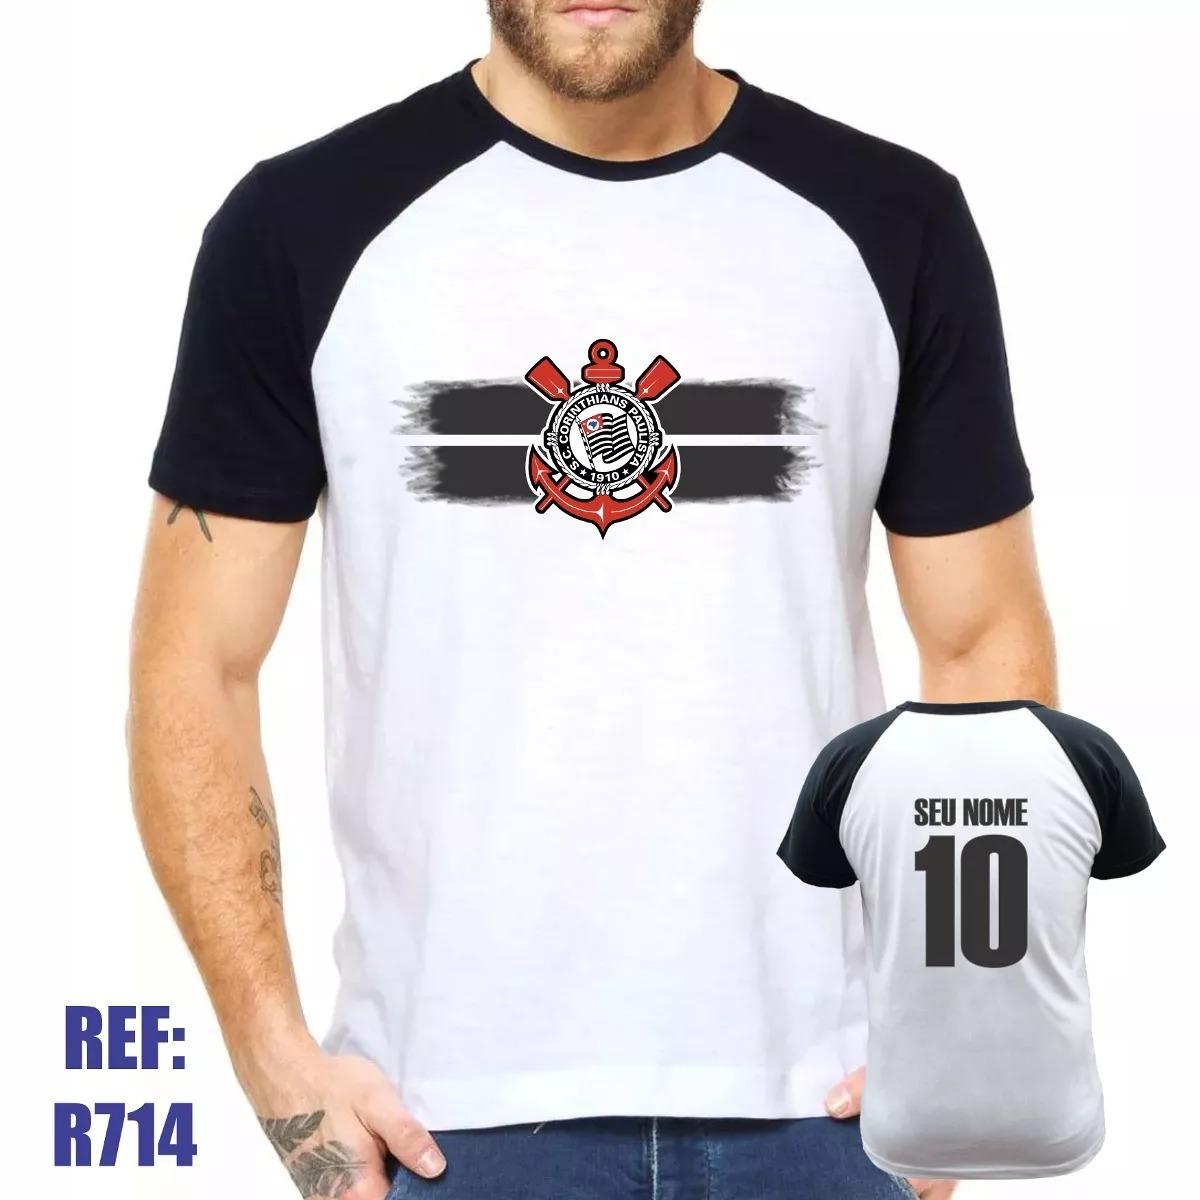 566b742599479 camisa raglan corinthians futebol personalizada com nome. Carregando zoom.